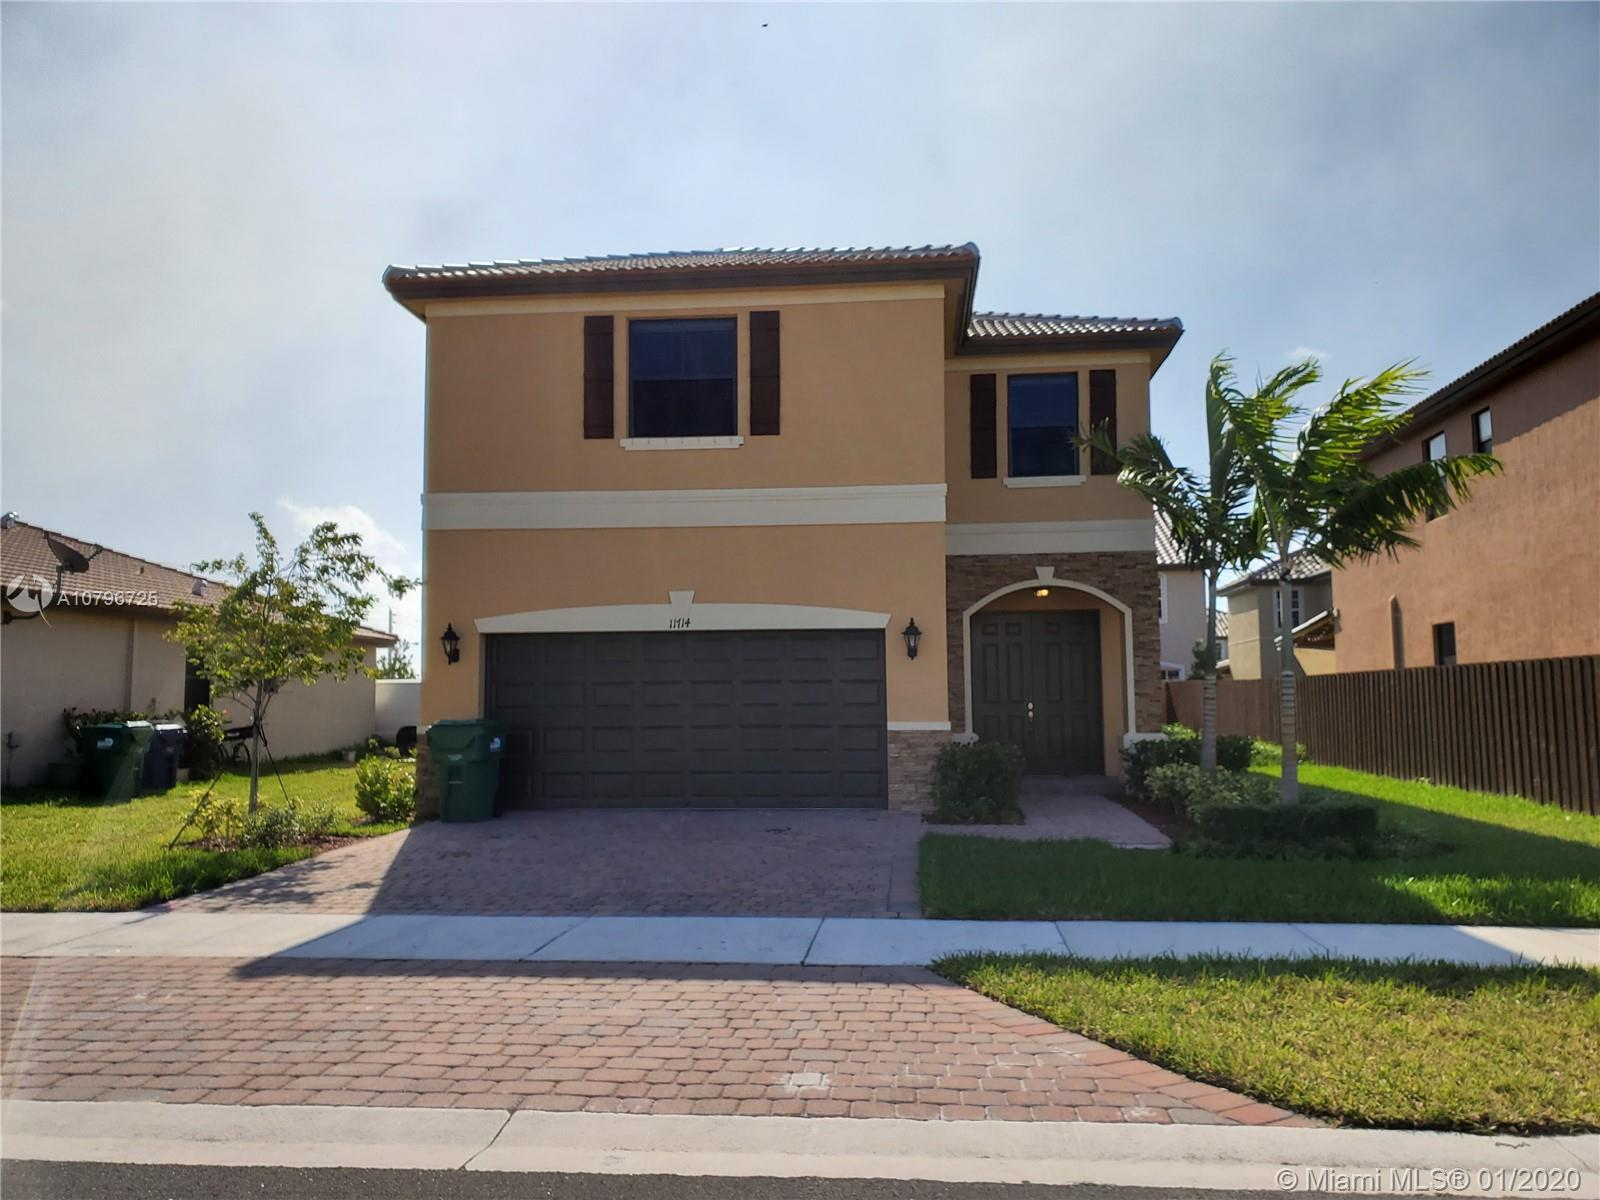 11714 SW 242nd Ter, Homestead, FL 33032 - Homestead, FL real estate listing